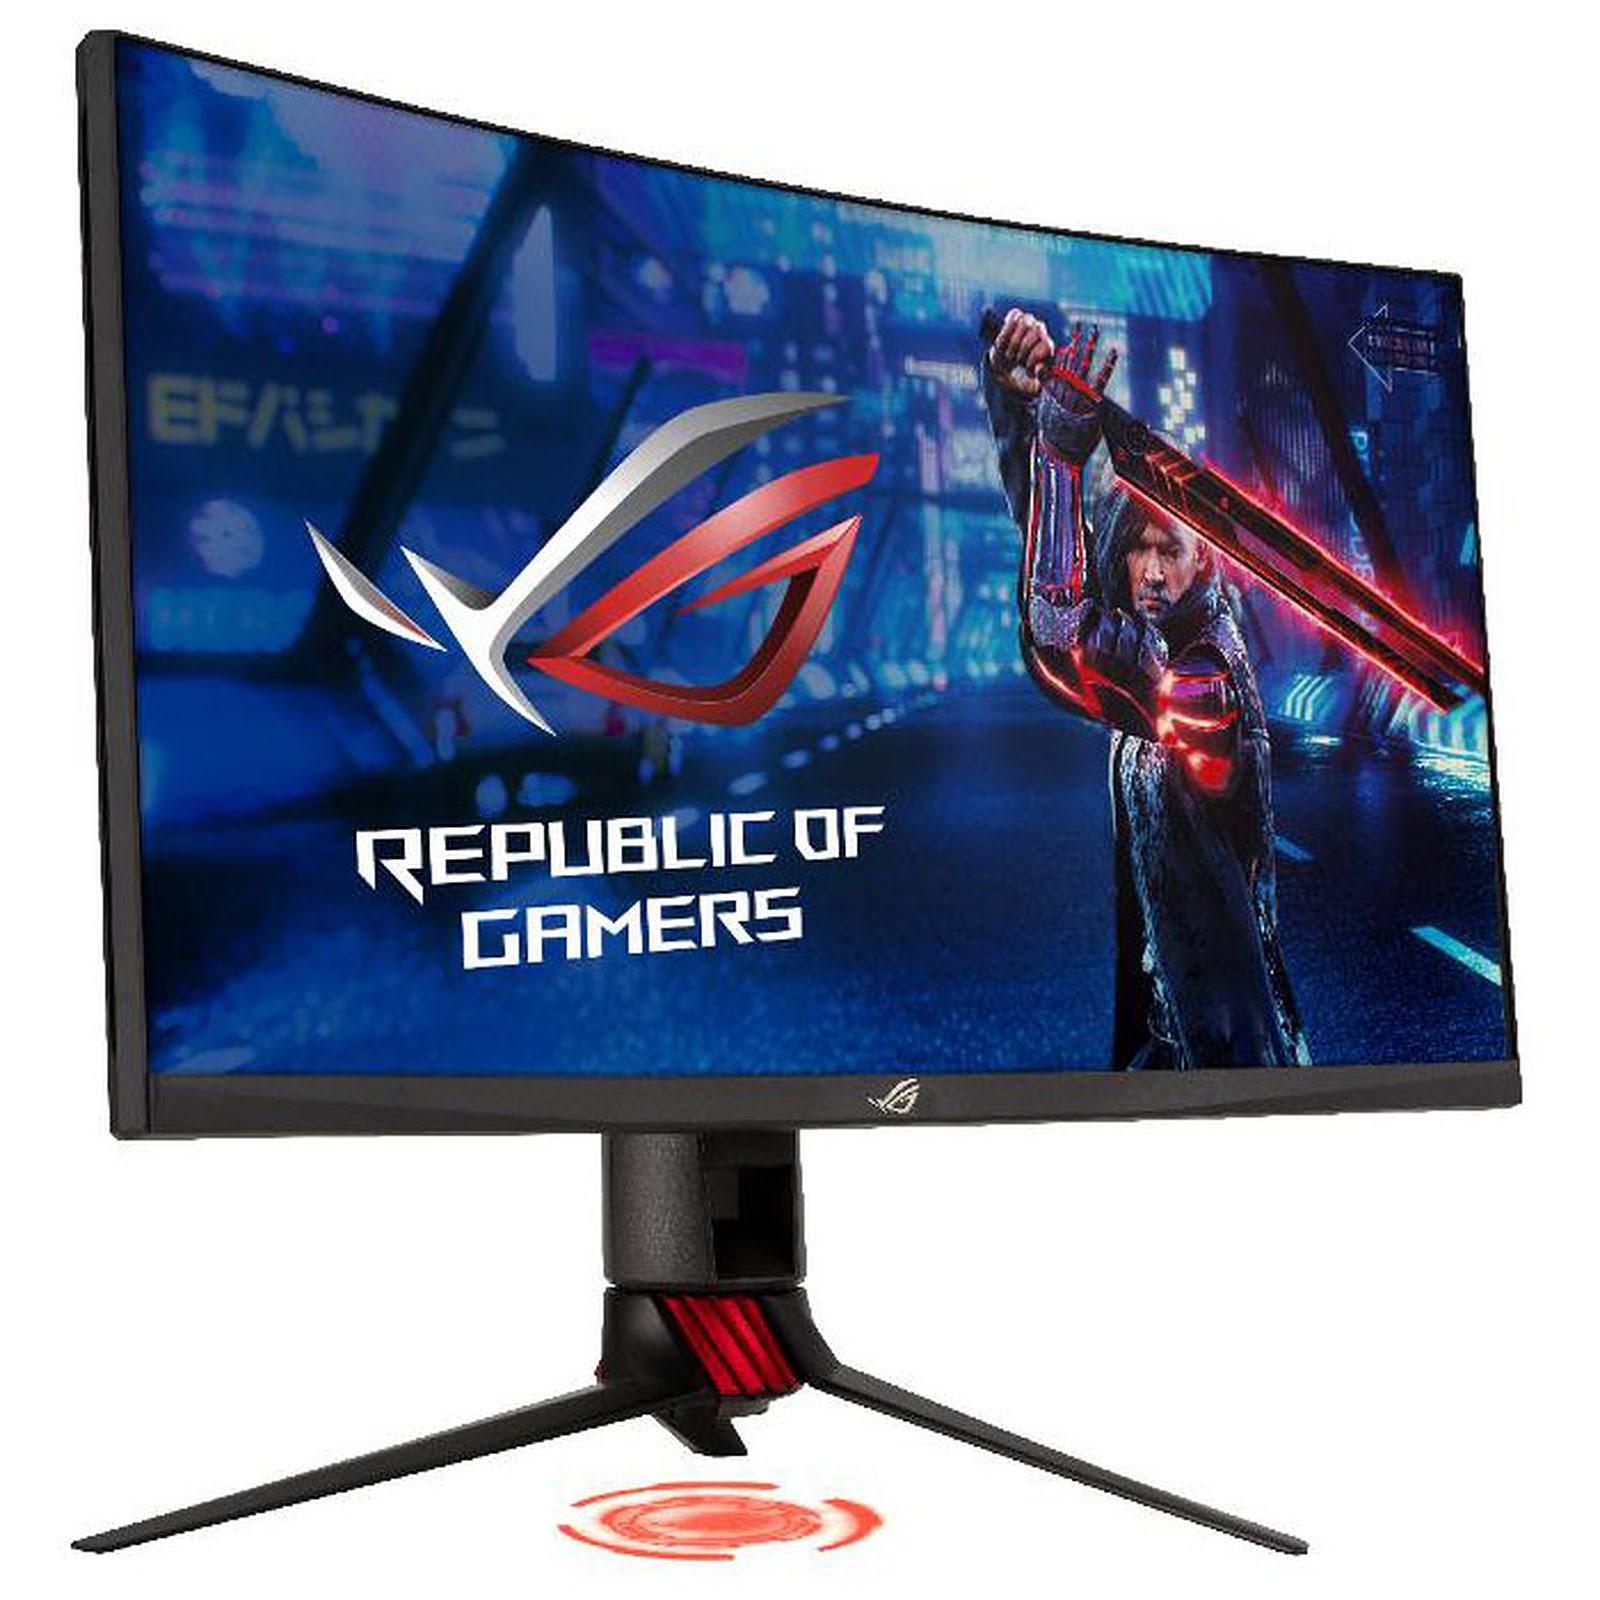 "XG27WQ - 27"" LED VA Incurvé/1ms/WQHD/HDMI/DP/165Hz (90LM05I0-B01970) - Achat / Vente Ecran PC sur Picata.fr - 3"